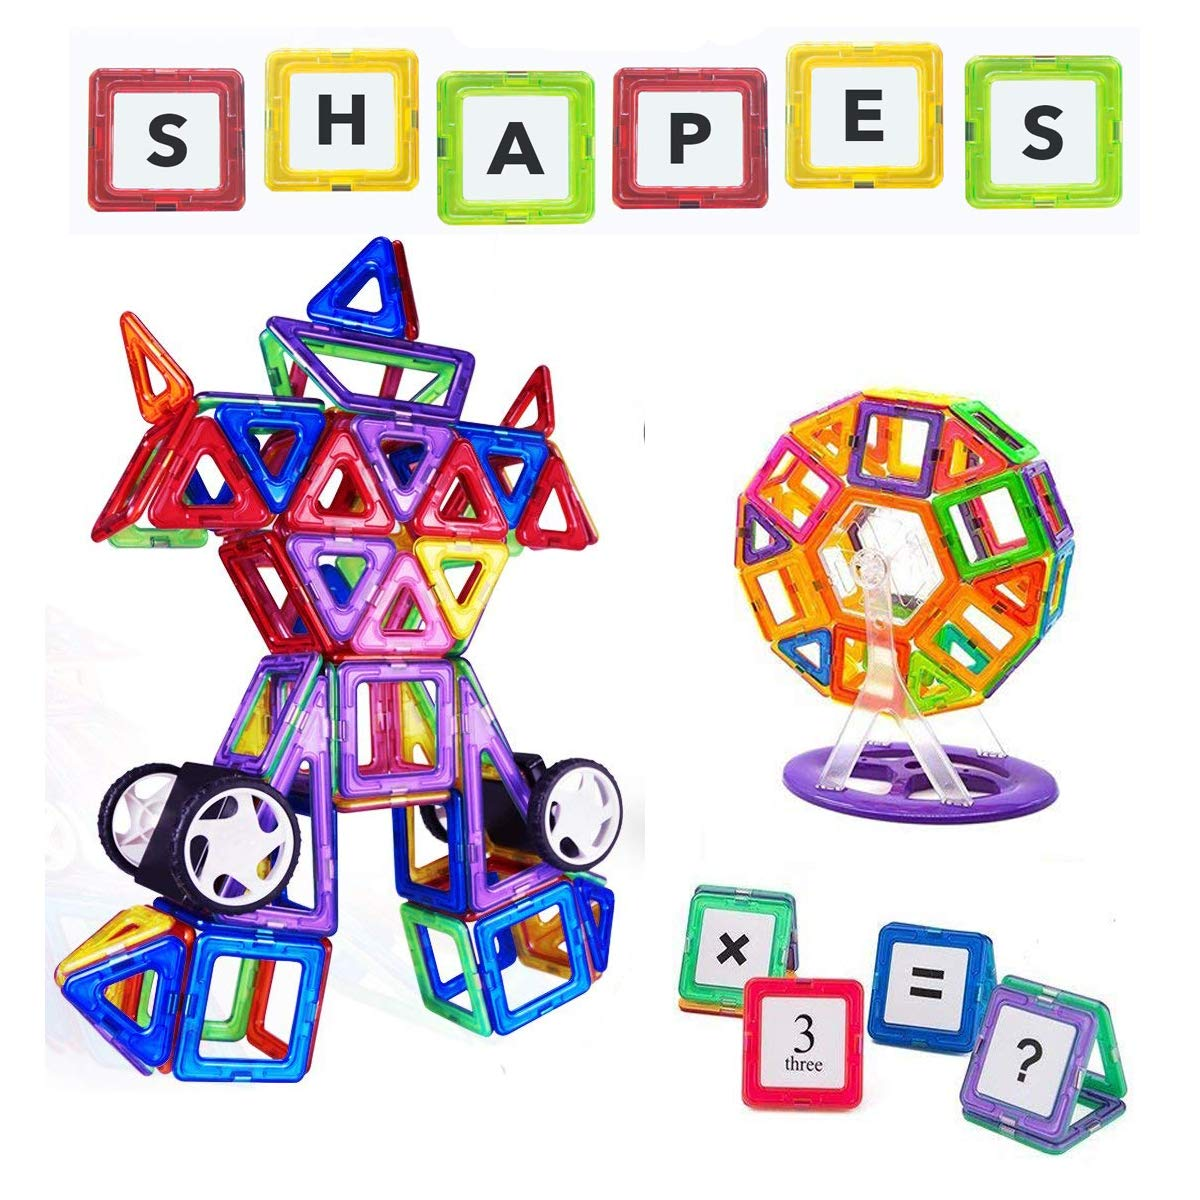 114Pcs Magnetic Building Blocks Toys, Educational STEM Building Set Tiles for Boys and Girls, Preschool Construction Kit for Toddlers, Kids